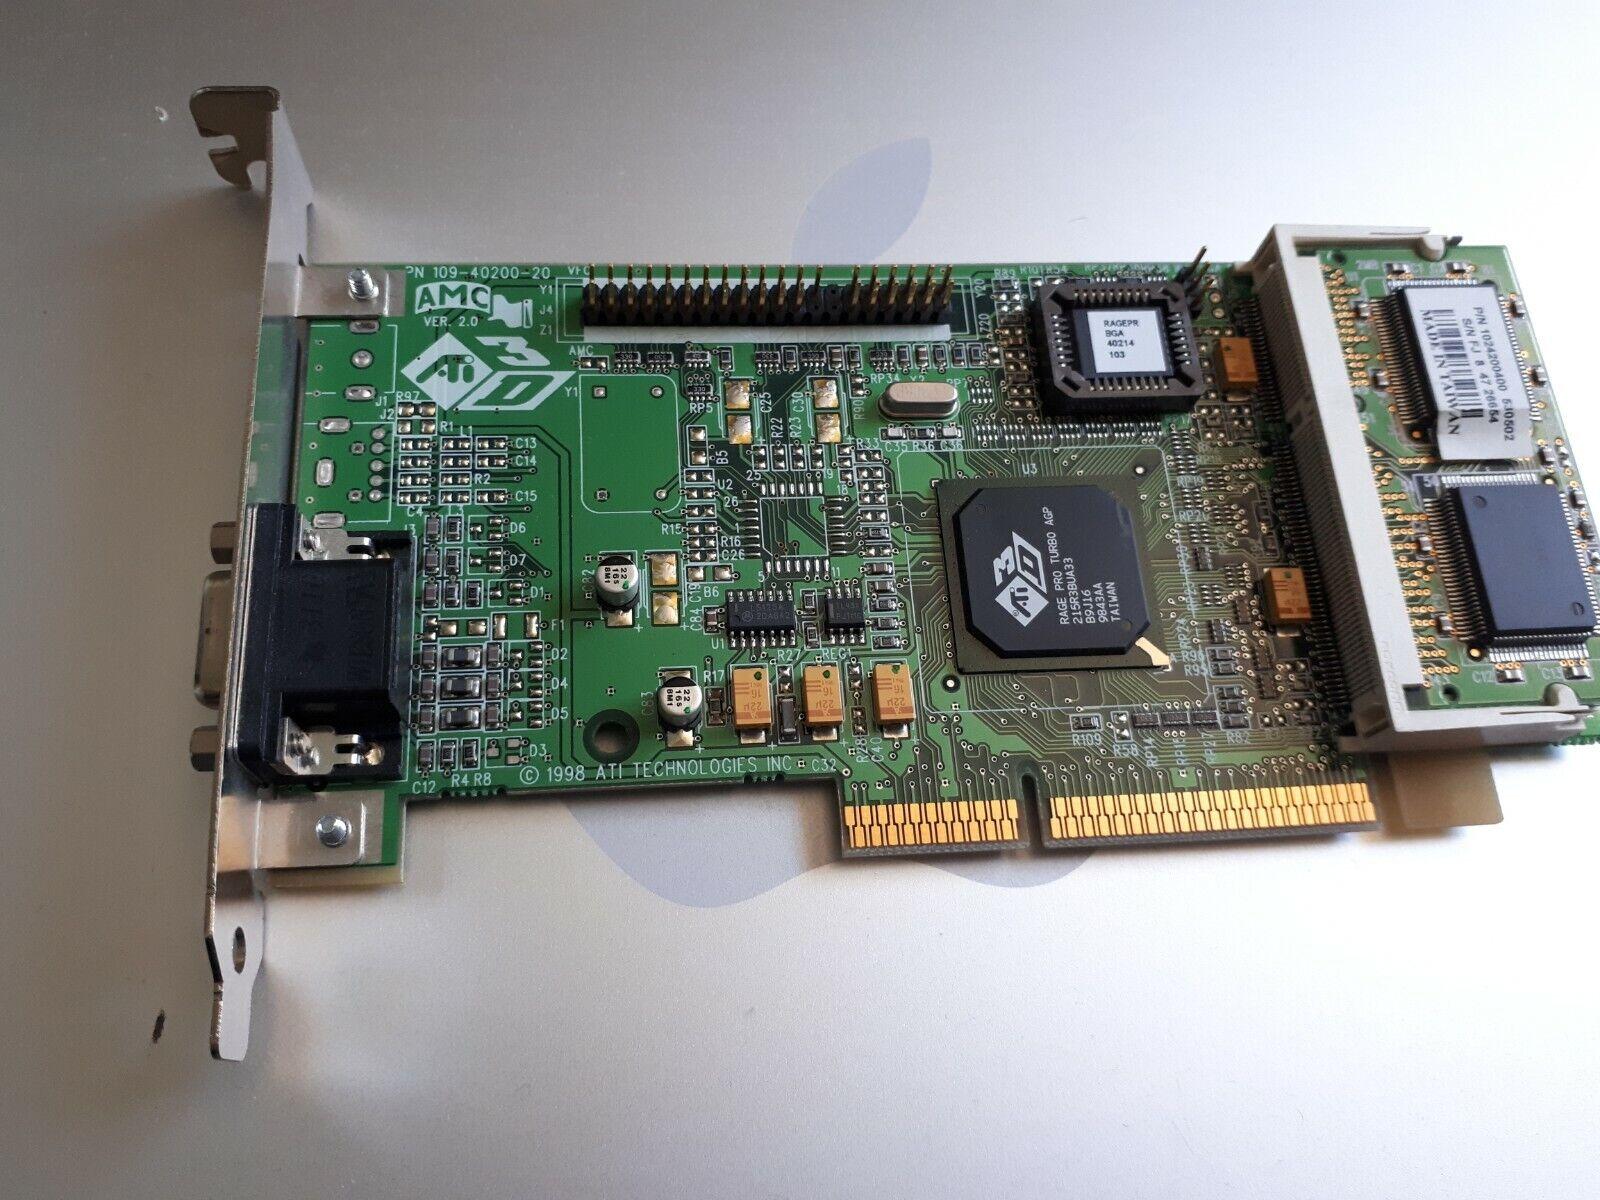 ATI 109-40200-20 3D Rage Pro Turbo AGP Video Graphics Card. S-Video RCA VGA Out